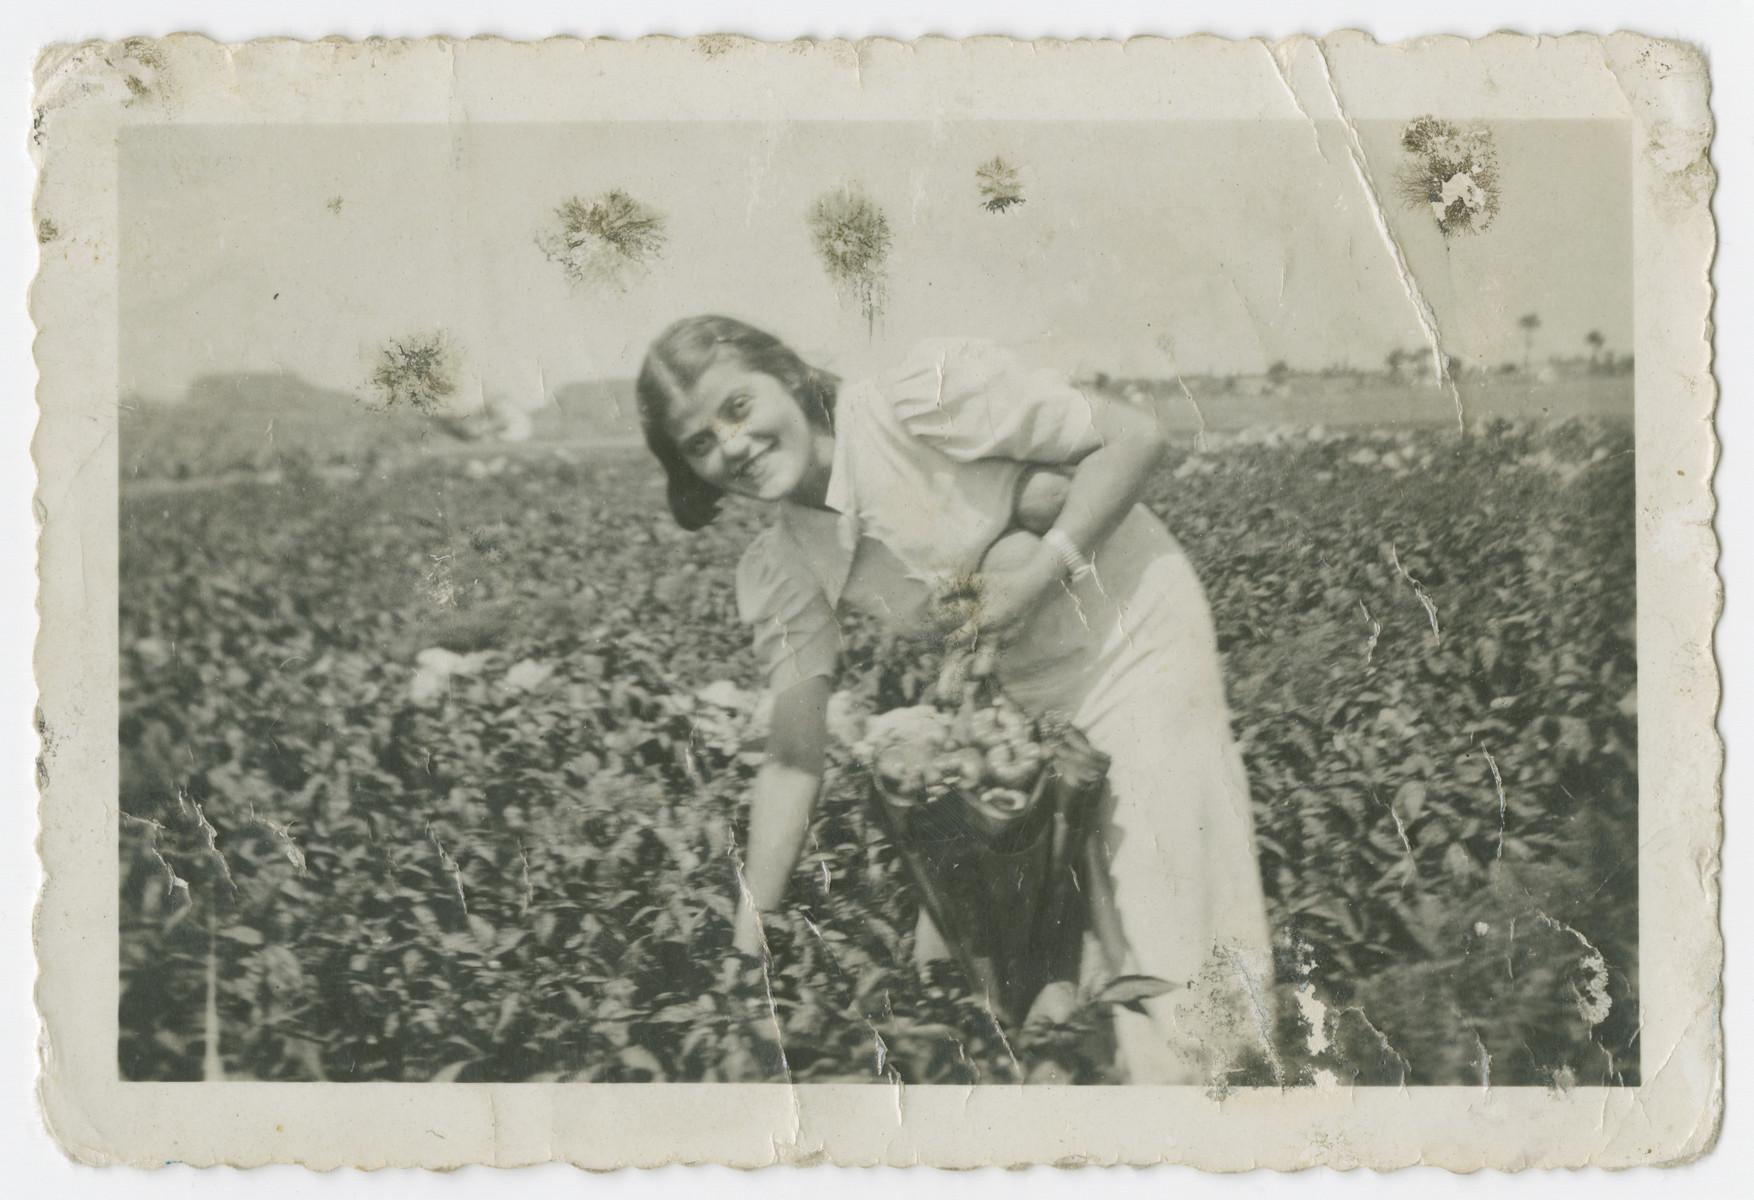 Friderika Klein picks produce in prewar Hungary.